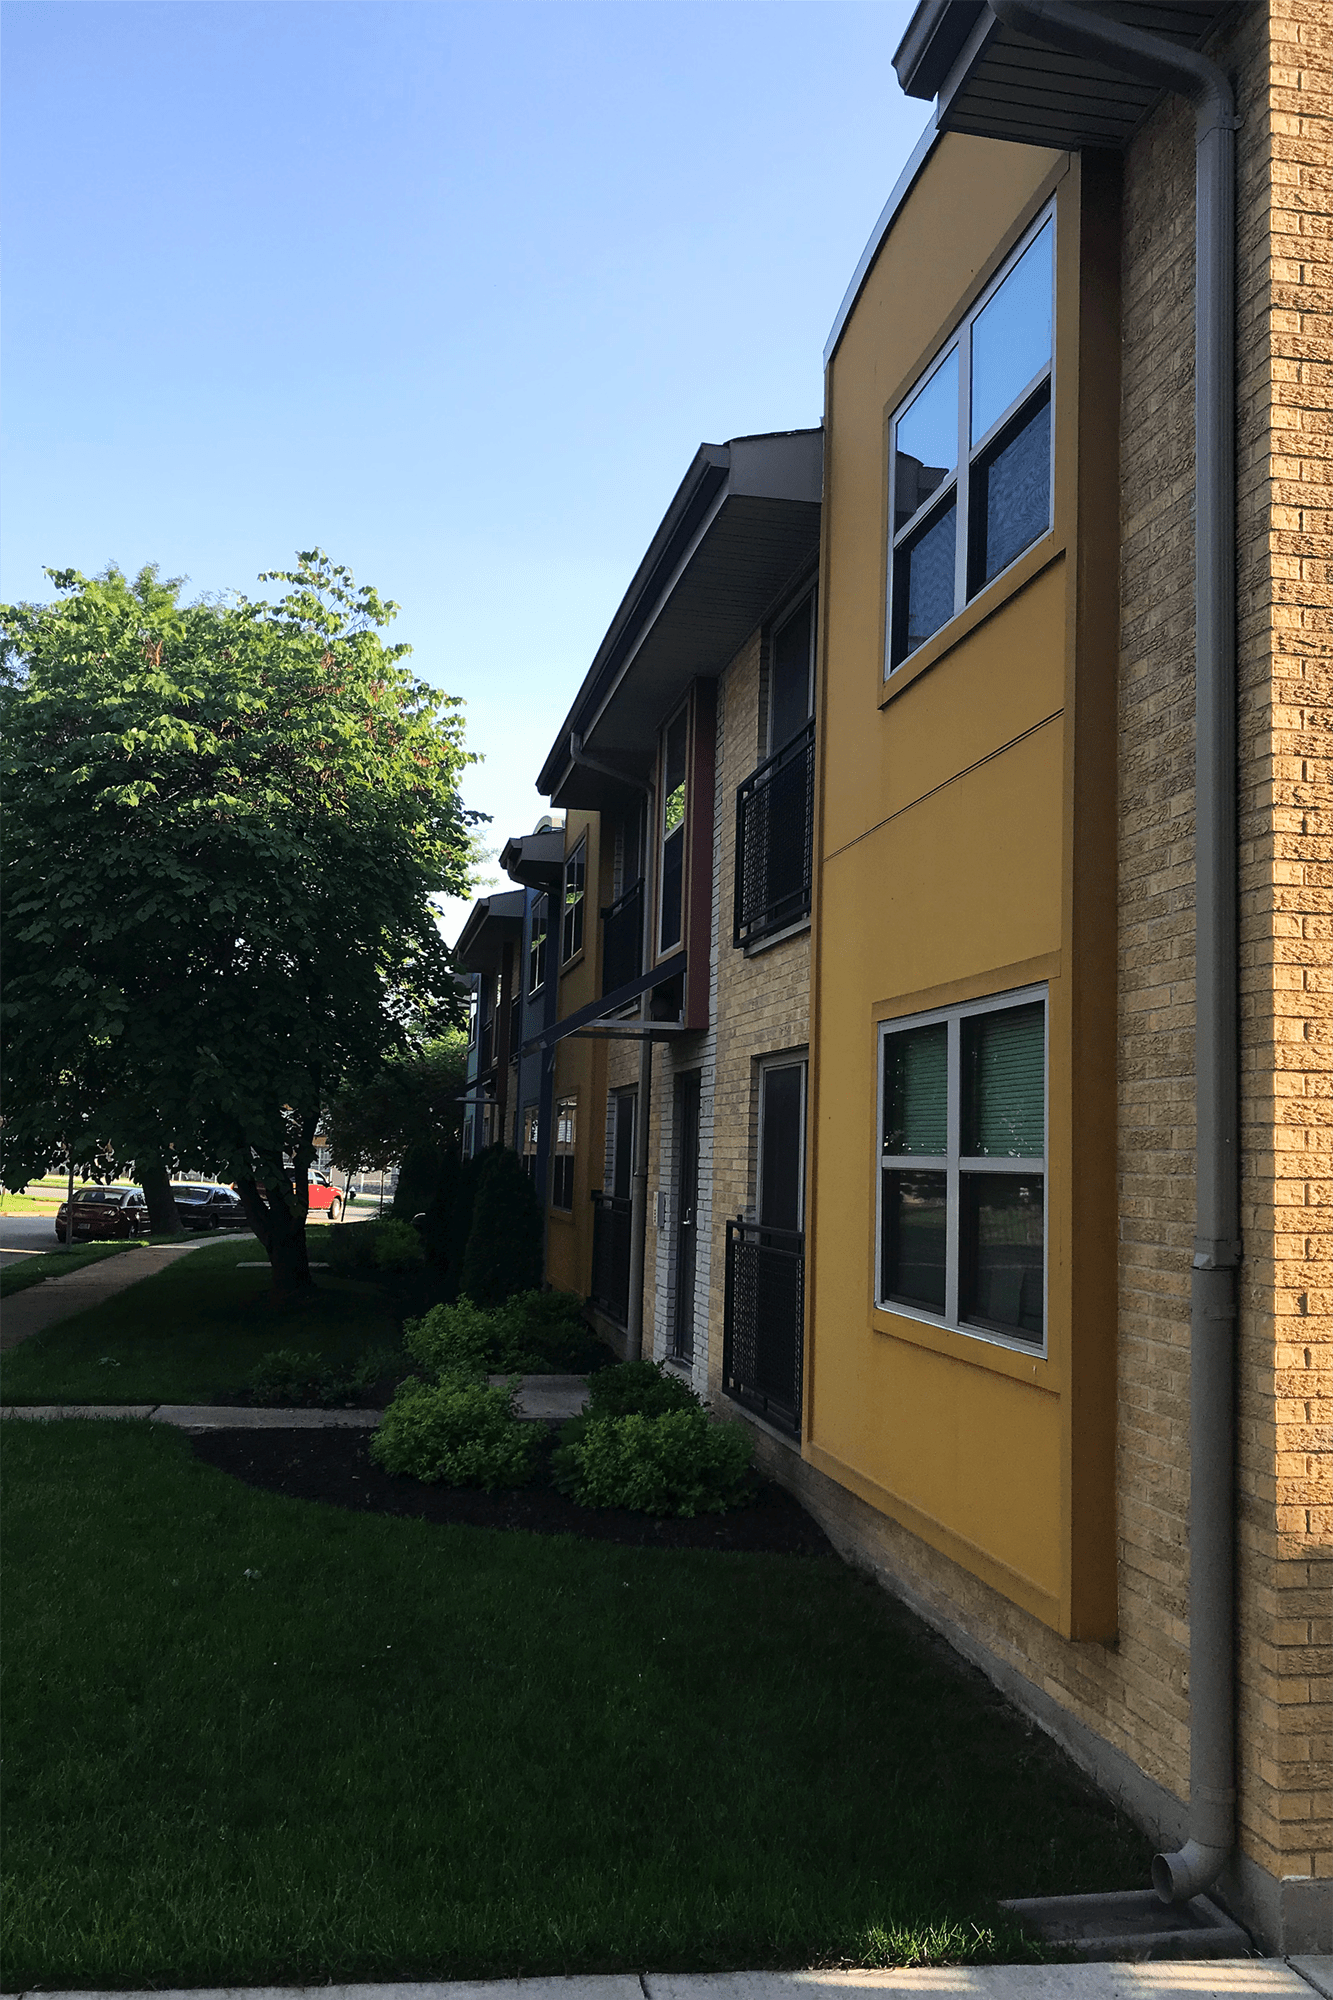 Fox Manor Apartments on Spring Avenue, one of Landmarks St. Louis' Most Enhanced award winners.